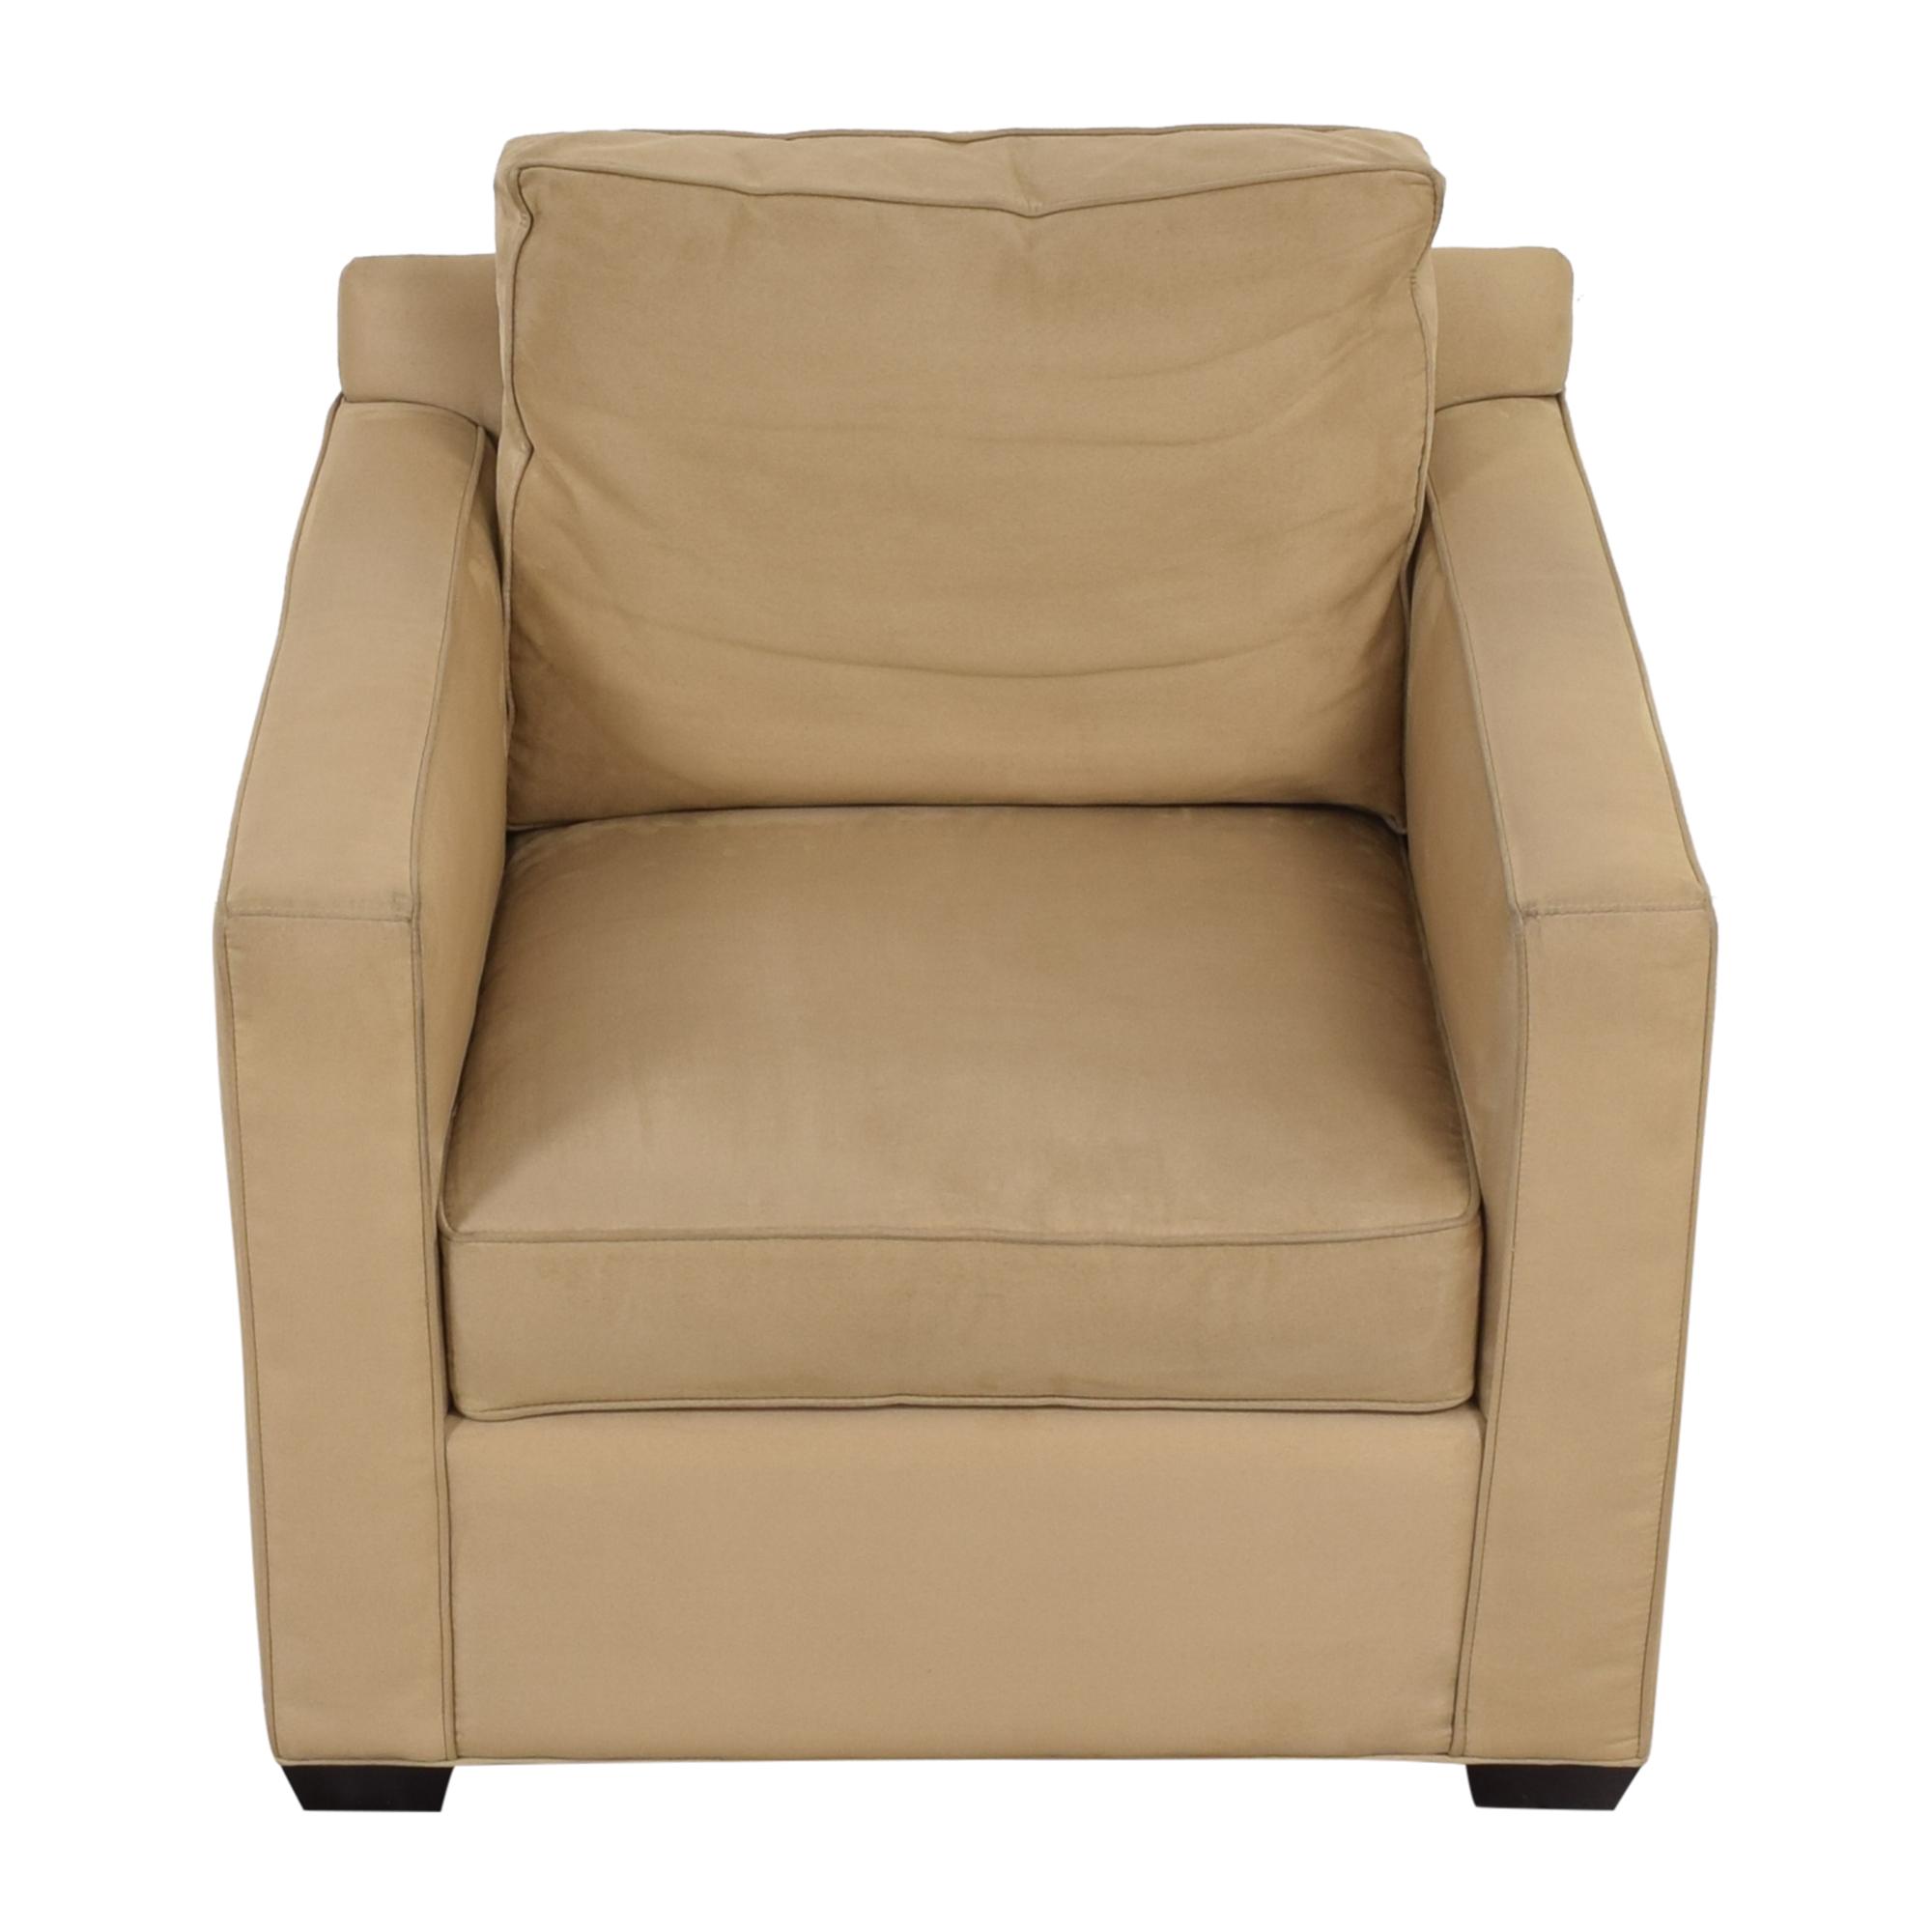 Crate & Barrel Davis Beige Accent Chair sale